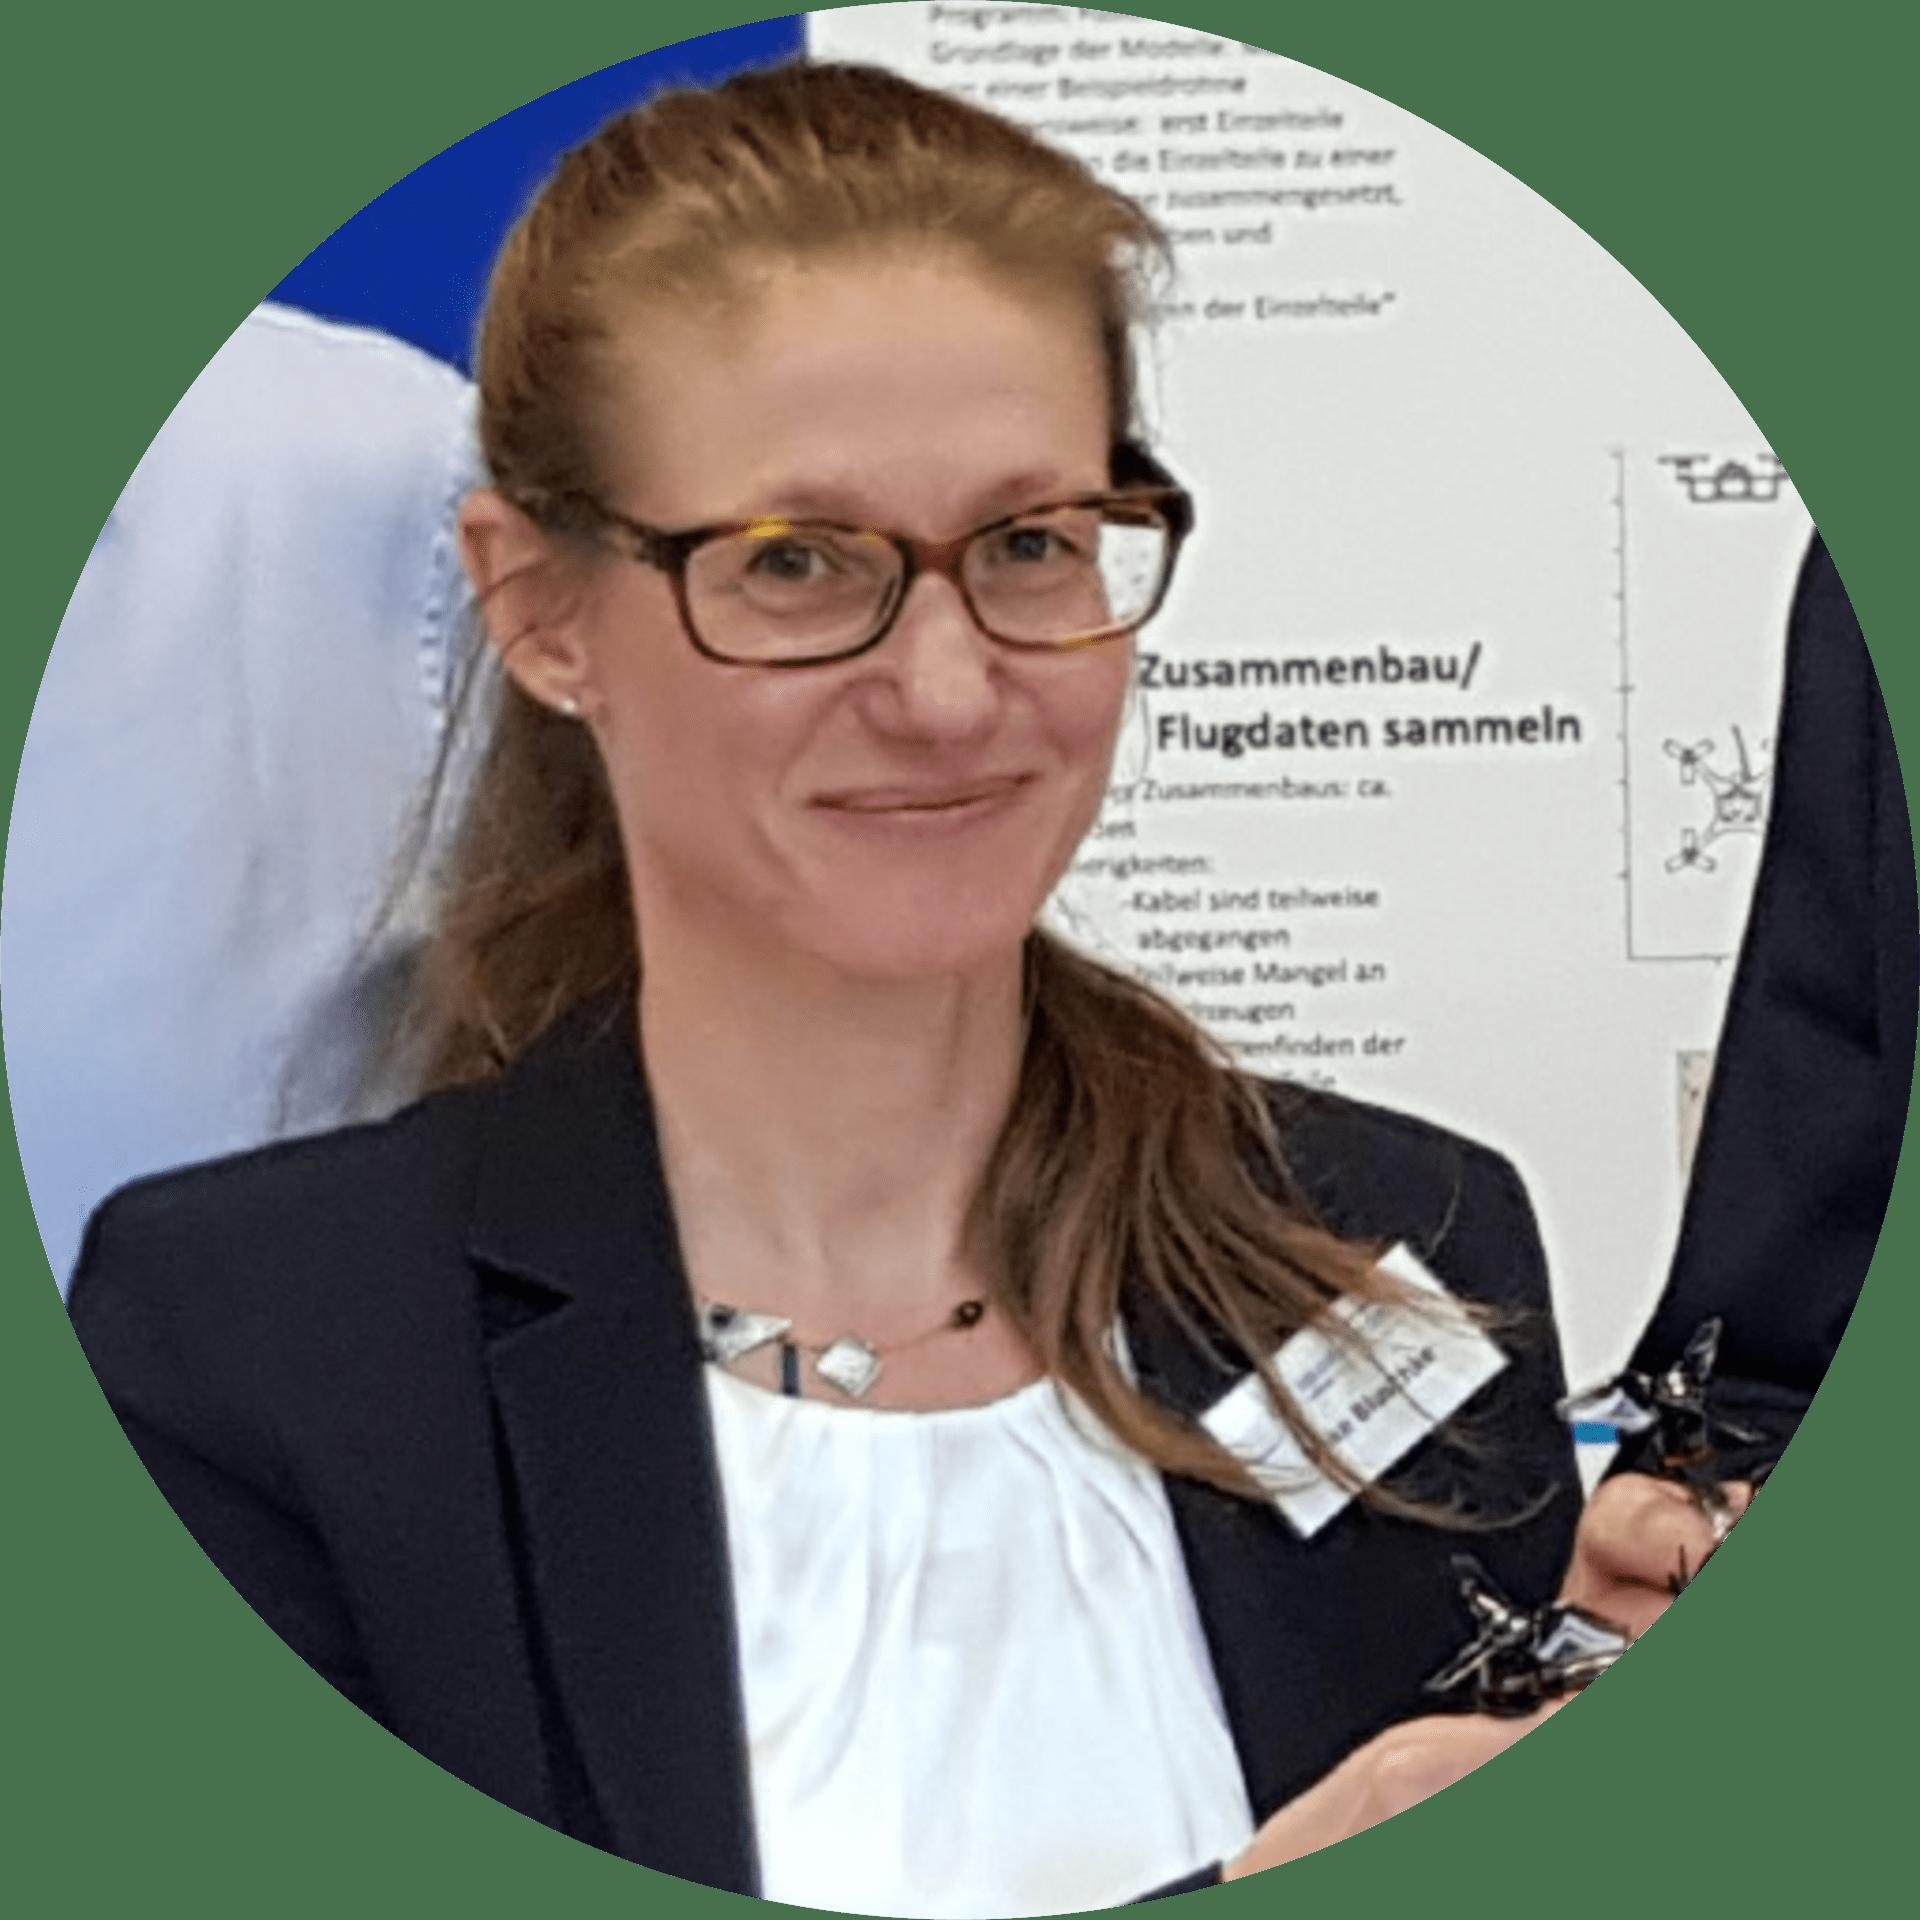 company contact Imke Bluschke